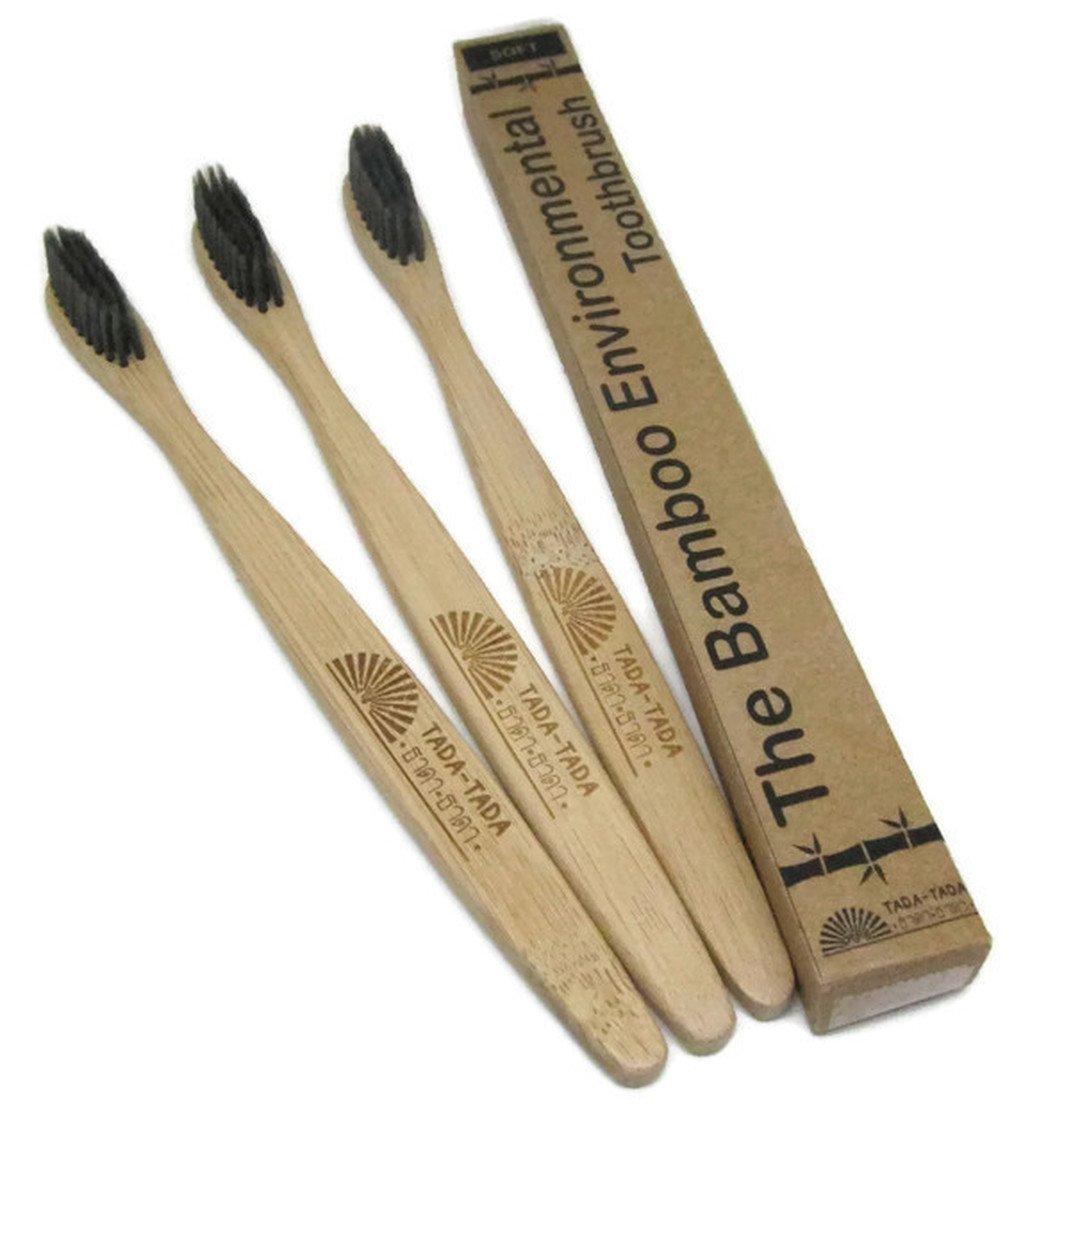 Bamboo Charcoal Extra Clean Toothbrush Natural 100% Soft Bristles by tada-tada 3Pcs.